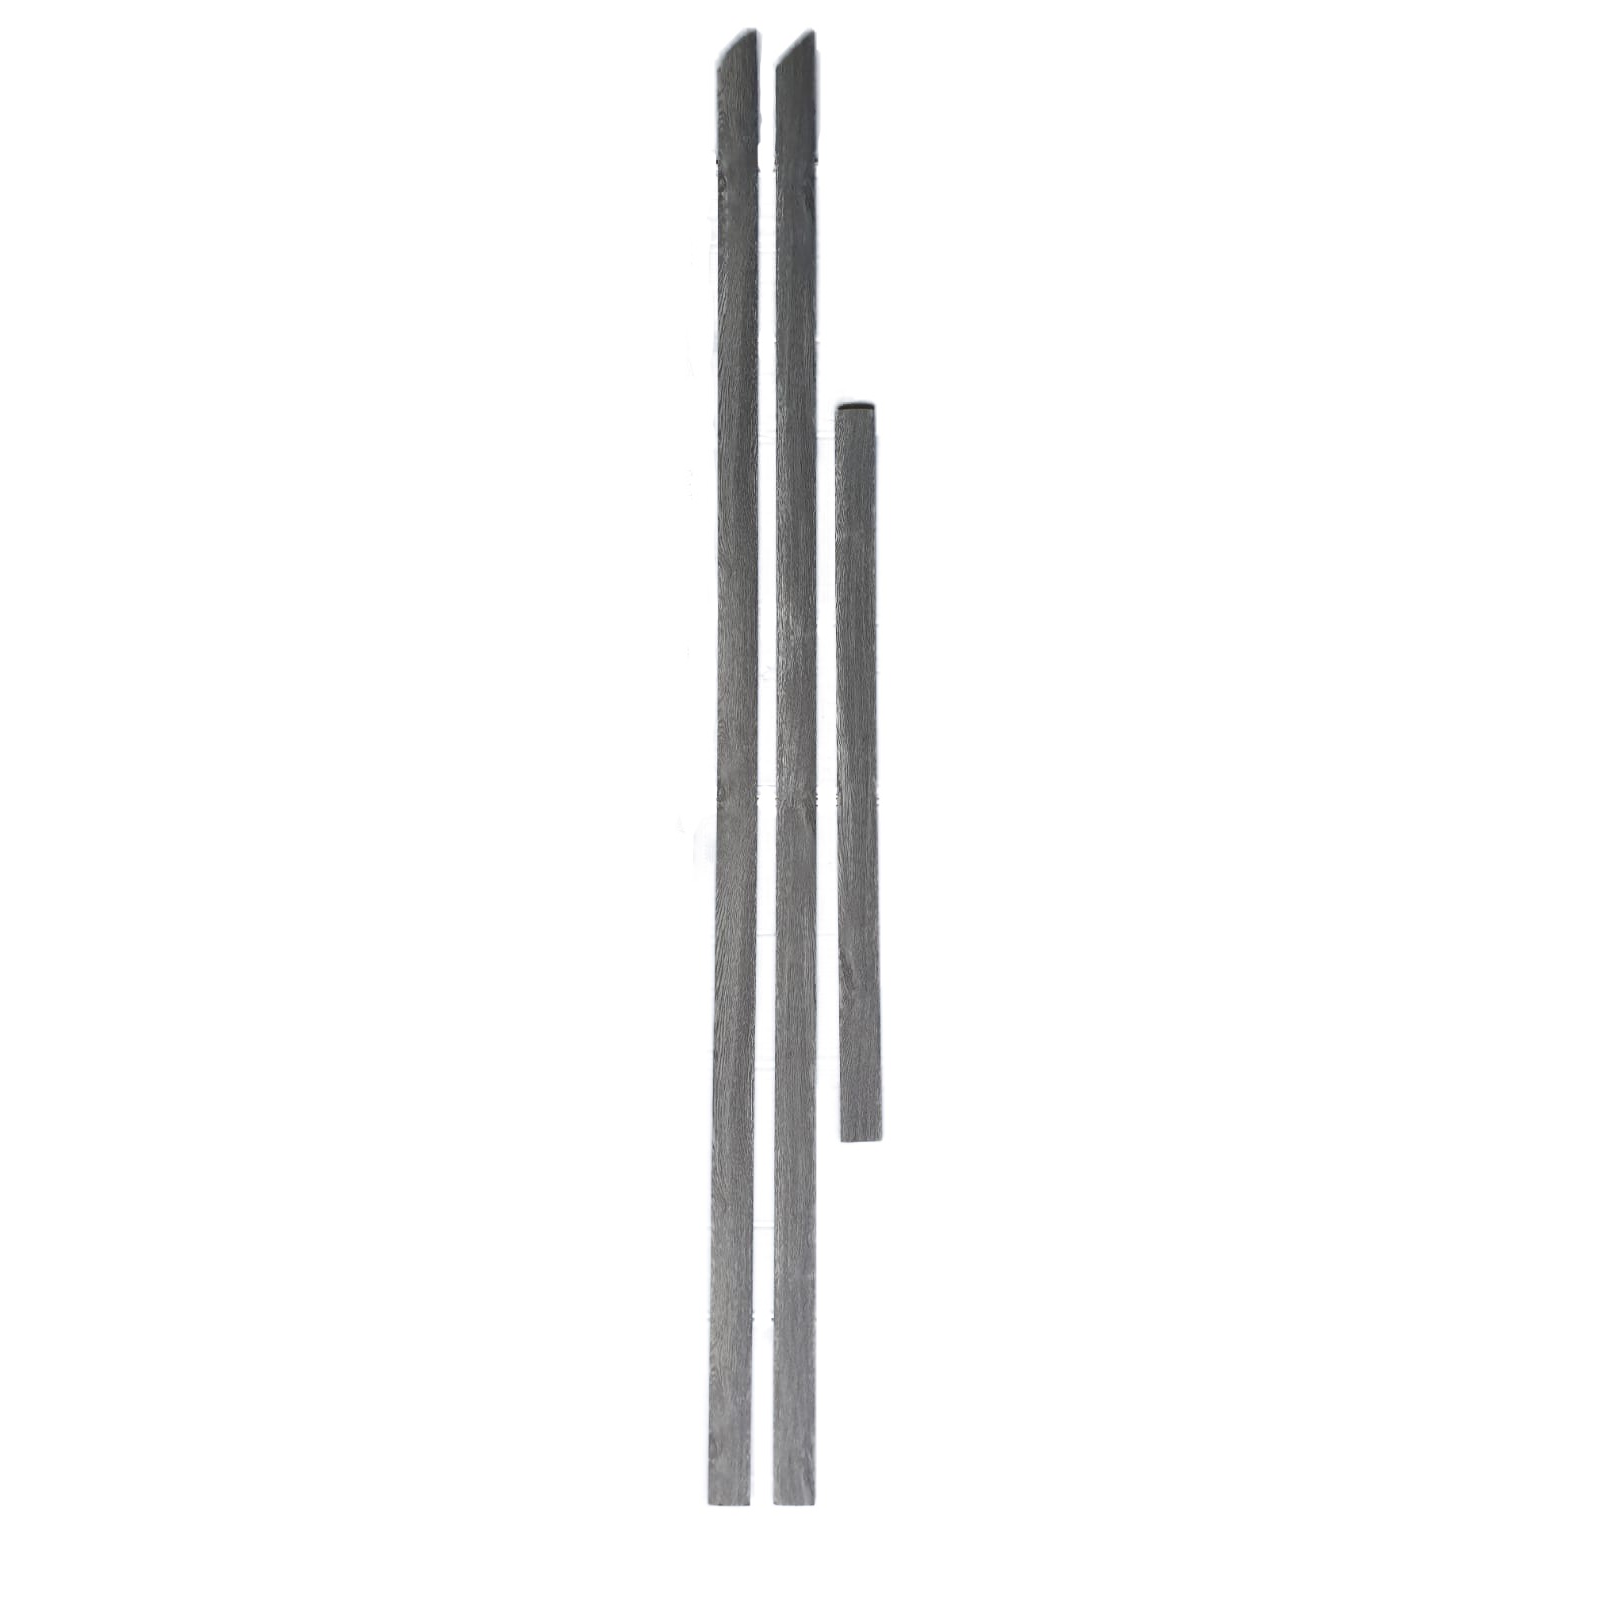 Pervaz usa interior gri, 6 x 0,5 cm mathaus 2021